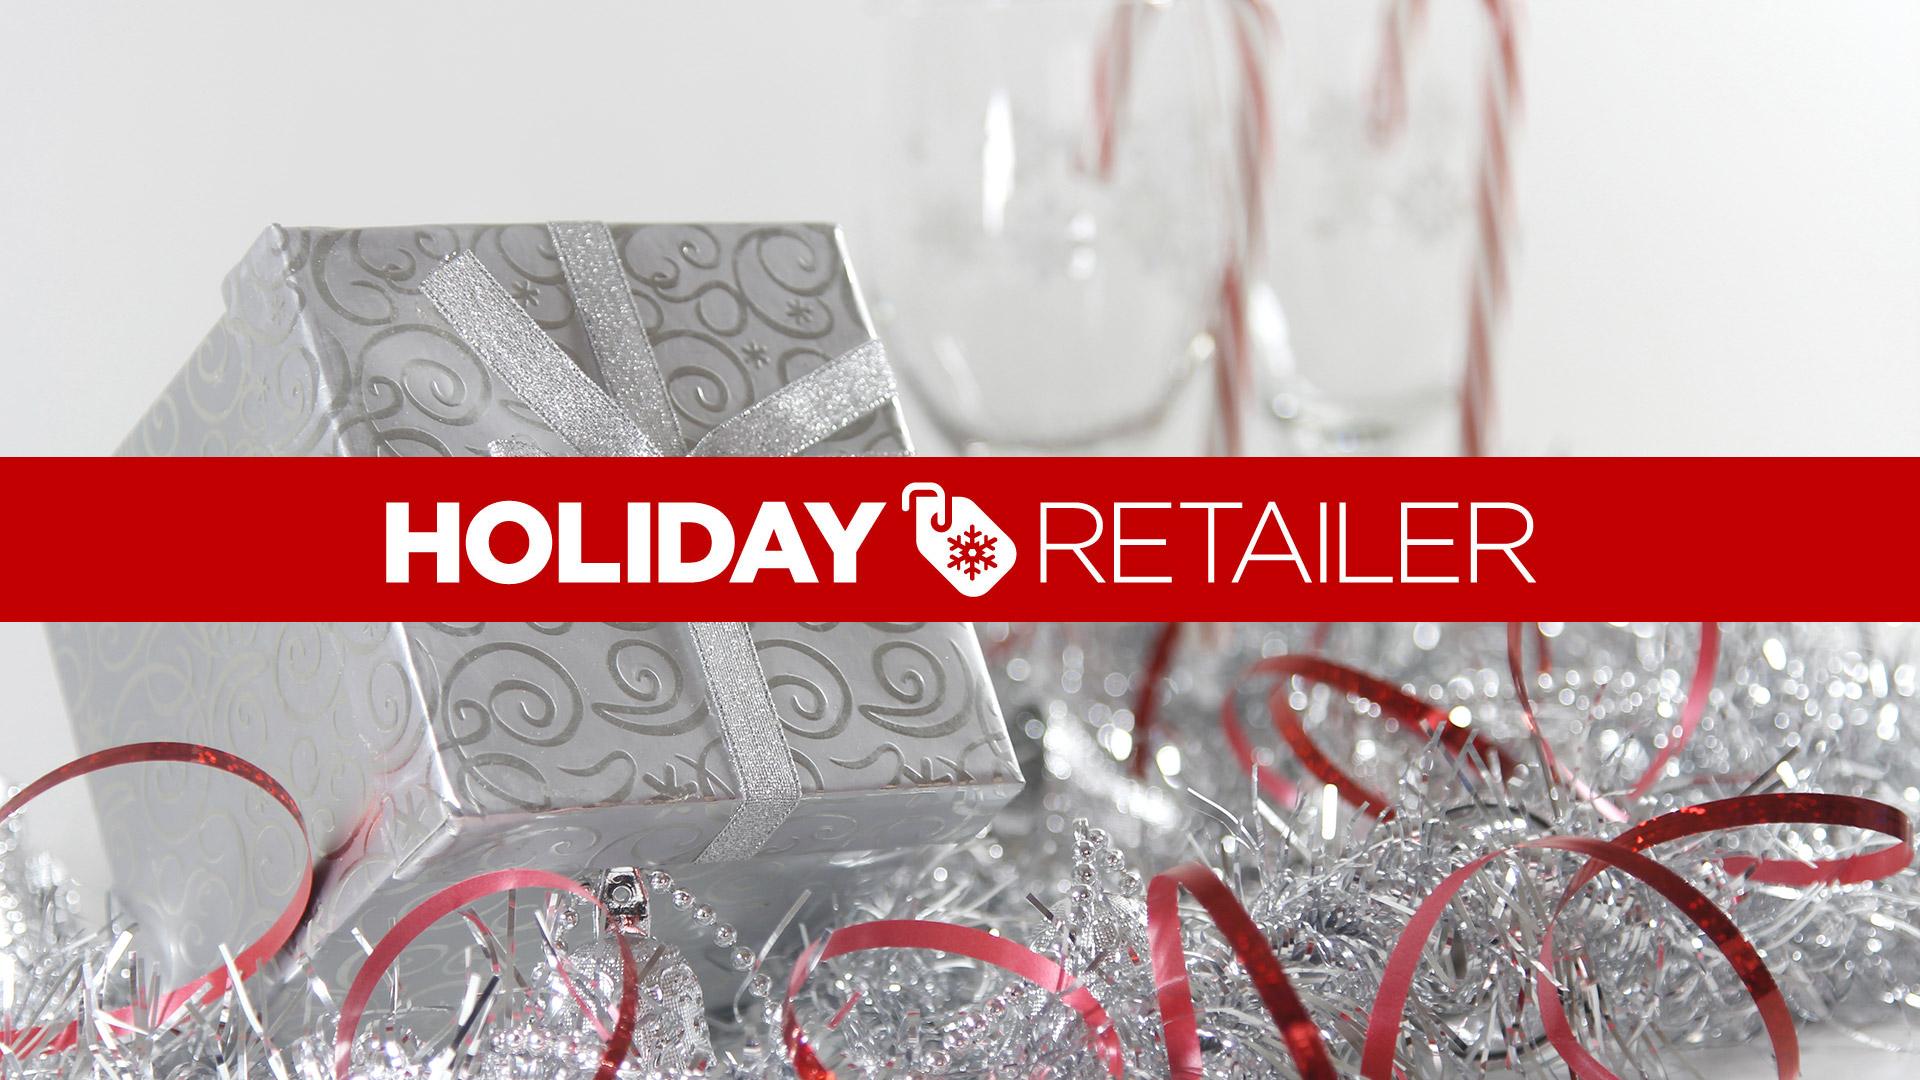 holiday-retailer8-1920